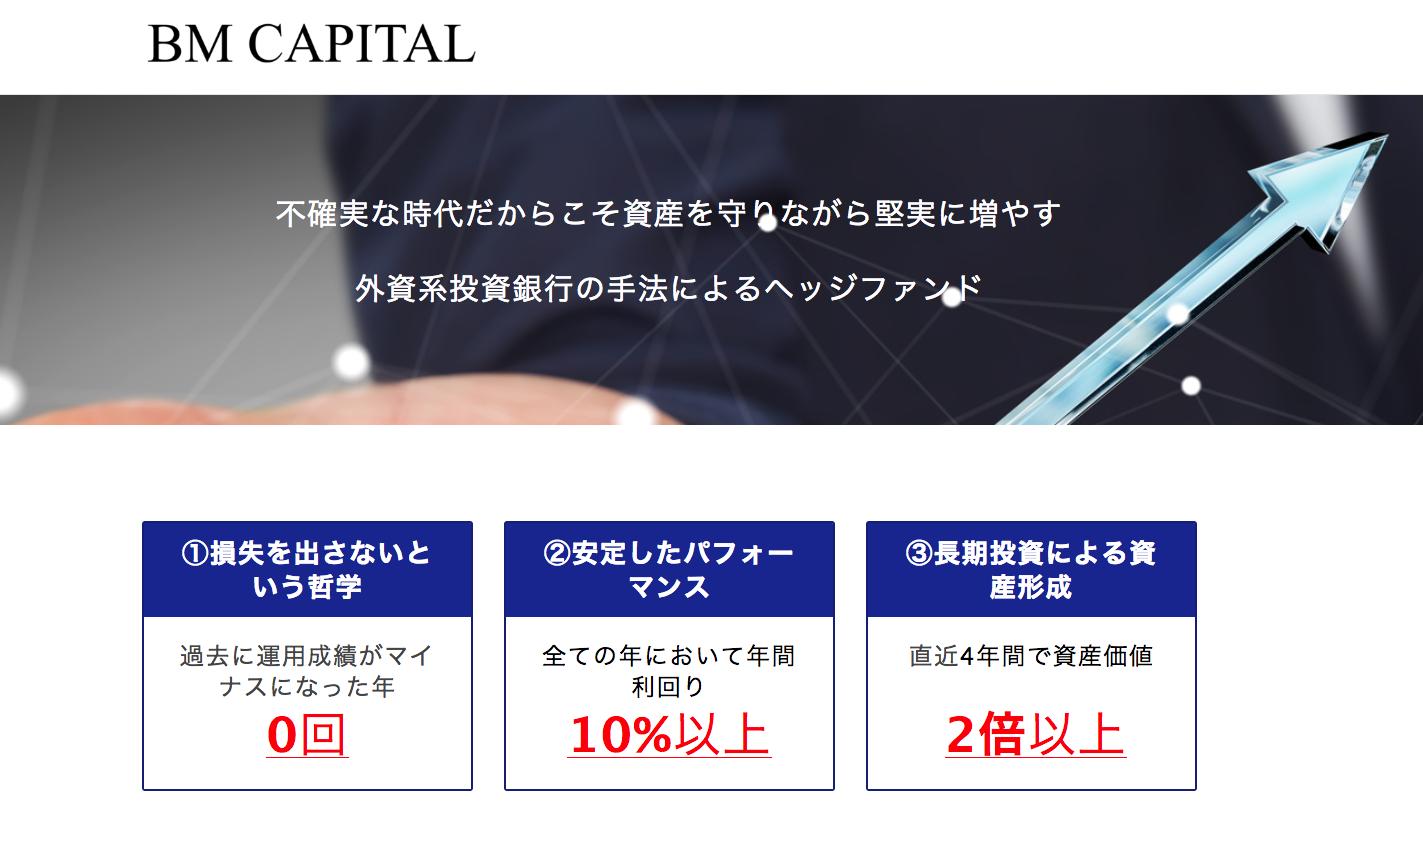 BM capital